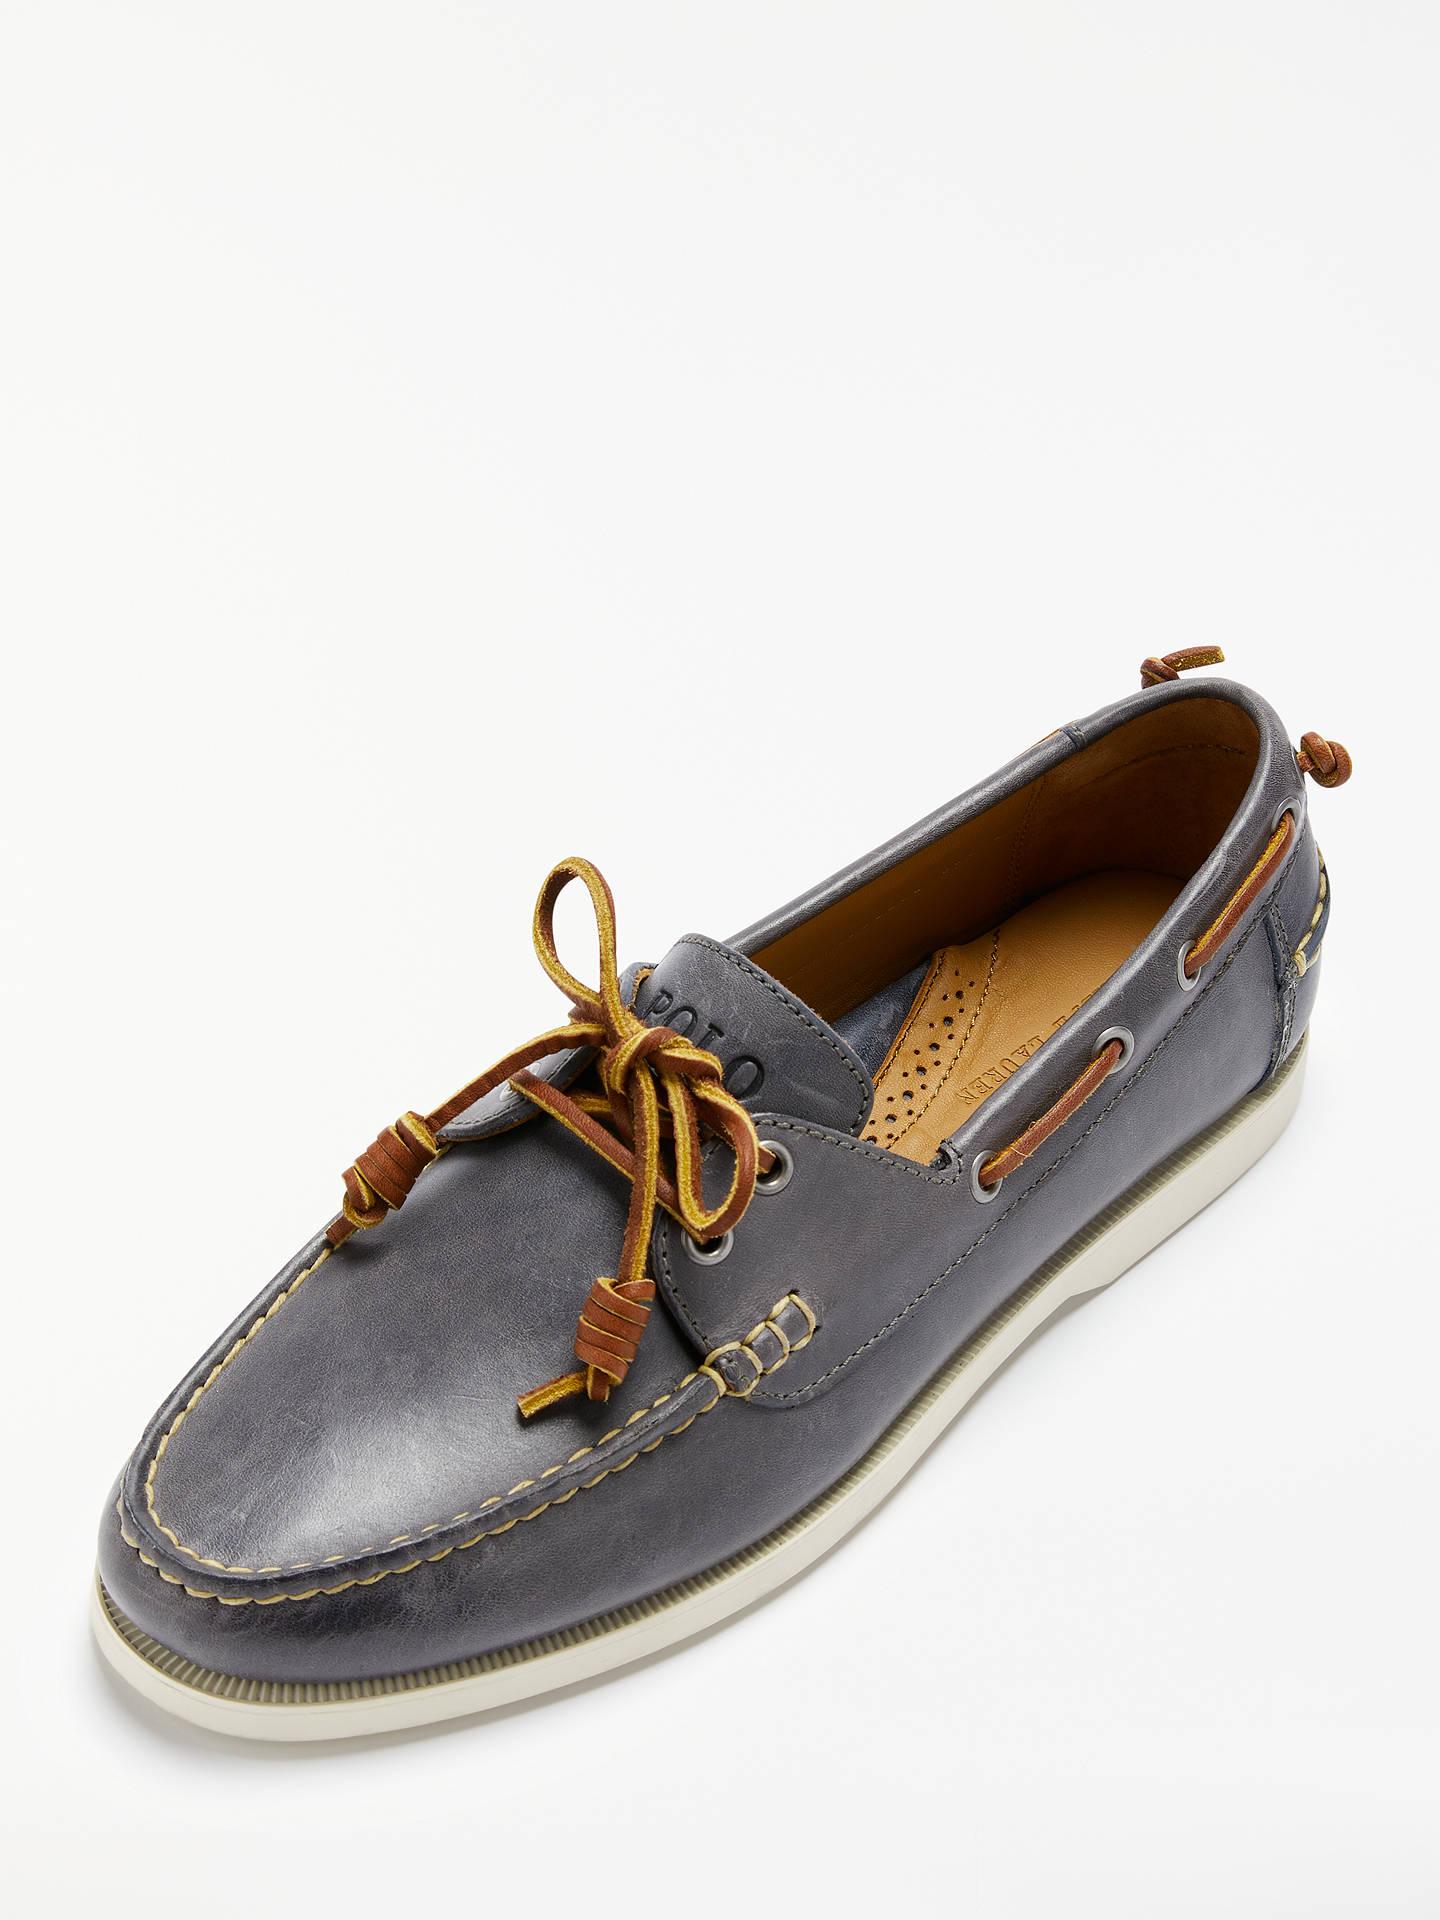 d13d3489c680 ... Buy Polo Ralph Lauren Merton Boat Shoes